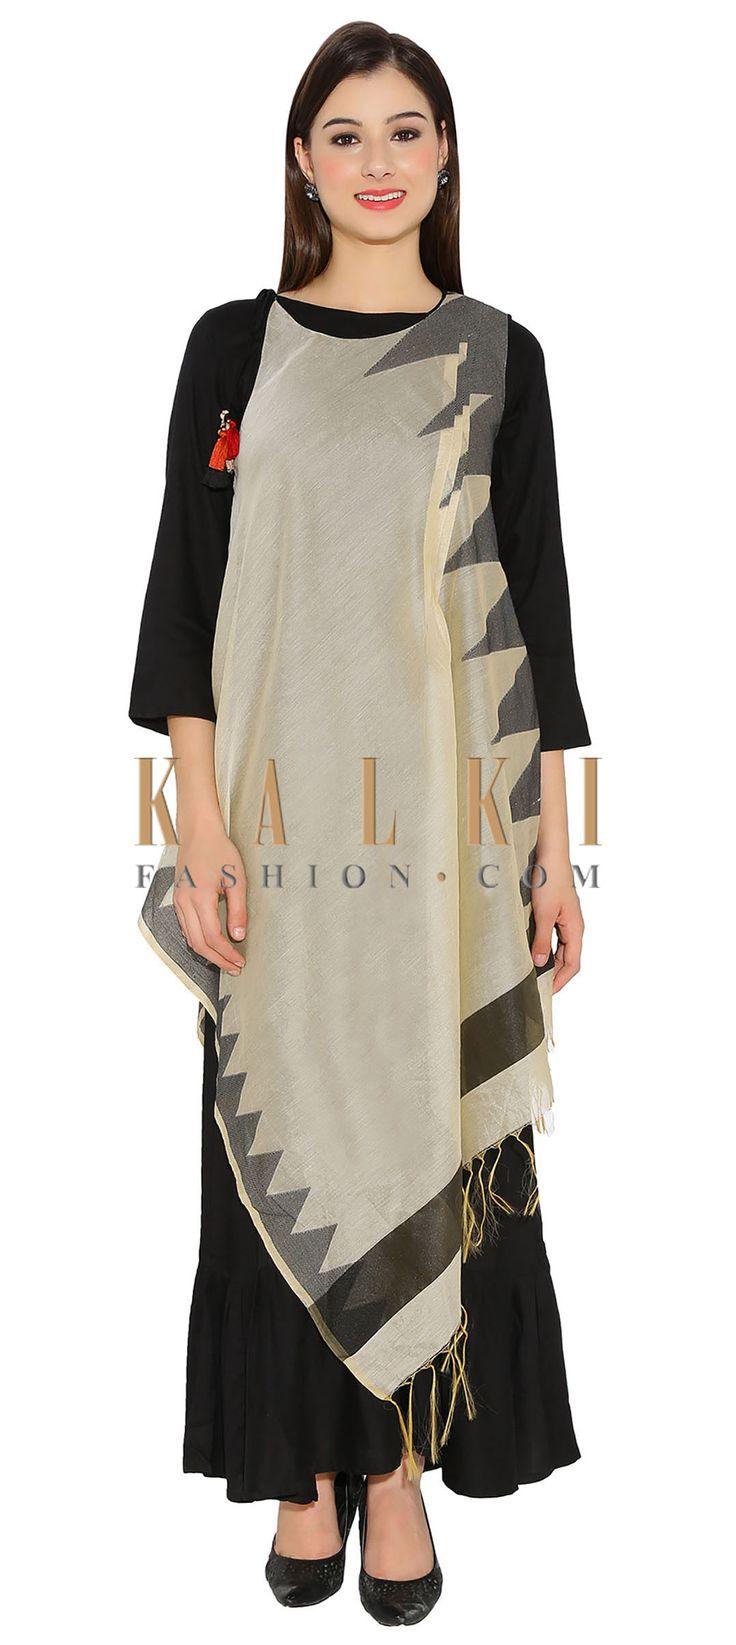 Black & Cream Cotton, Silk Kurti With Asymmetric Silhouette And Temple Motif Thread Tassels Bohemian Style Only On Kalki